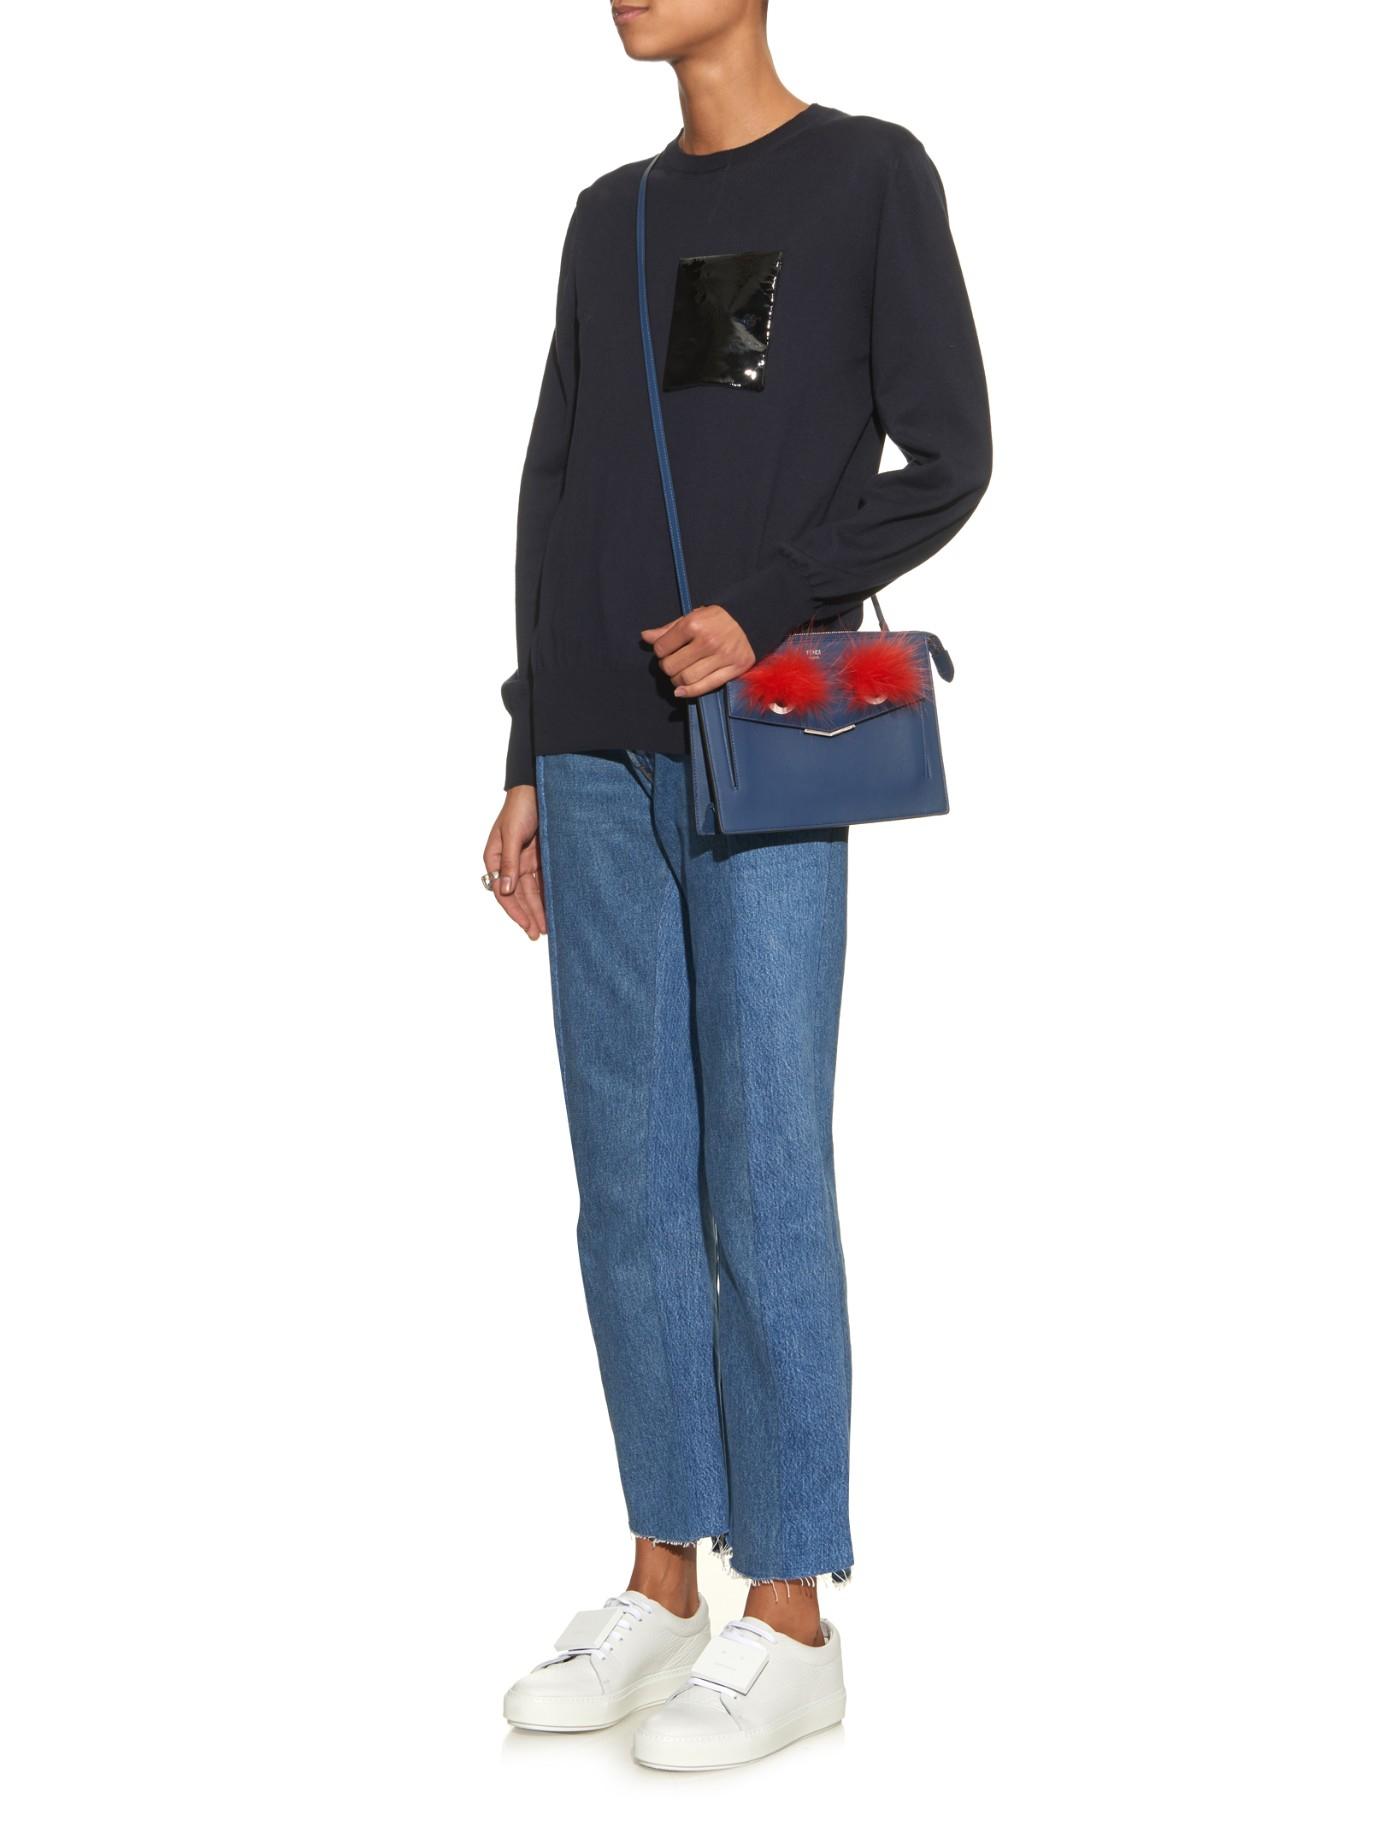 7bad6c592a55 ... cheapest lyst fendi 2jours bag bugs leather cross body bag in blue  d4e8d b6cbd